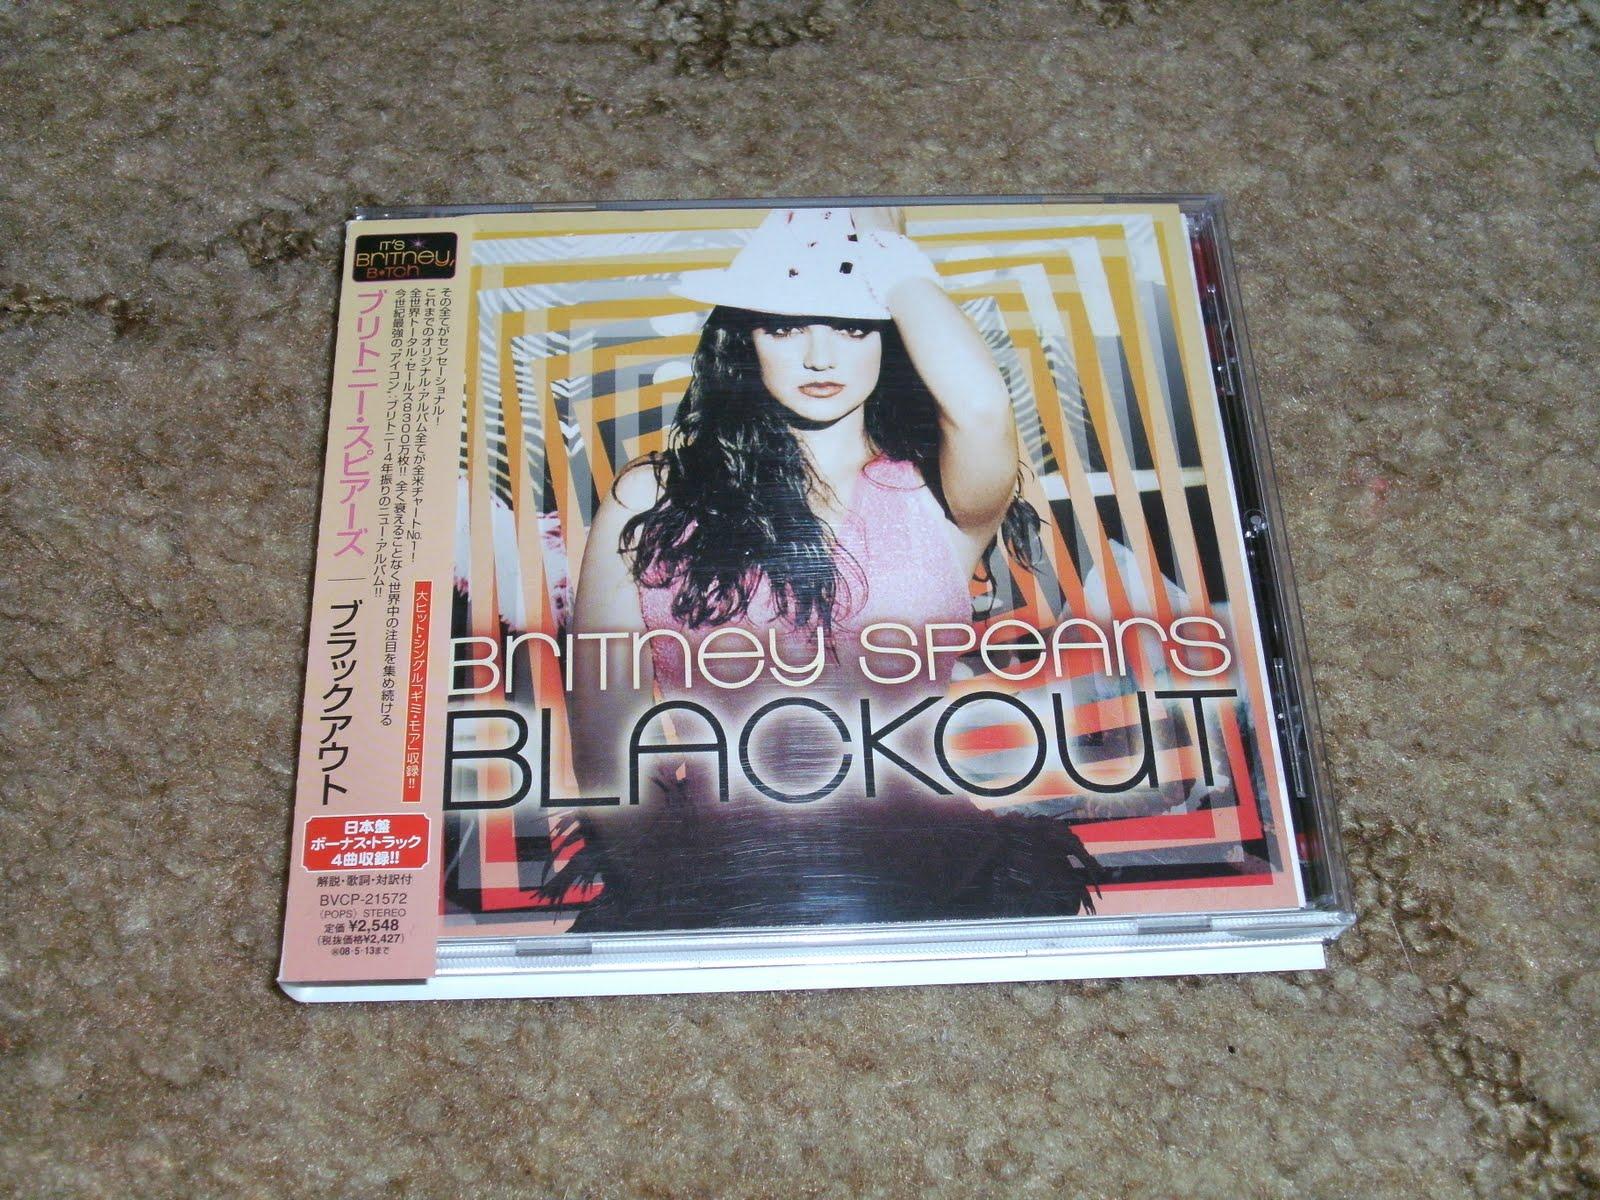 http://1.bp.blogspot.com/-qAlrOiTki-I/ThzTlLvWCaI/AAAAAAAAAHQ/aE2rcd-g2P8/s1600/Blackout%2B%2528Japan%2BDeluxe%2BEdition%2Bwith%2BLyrics%2BBooklet%252C%2BSticker%252C%2Band%2BObi%2BStrip%2529.JPG